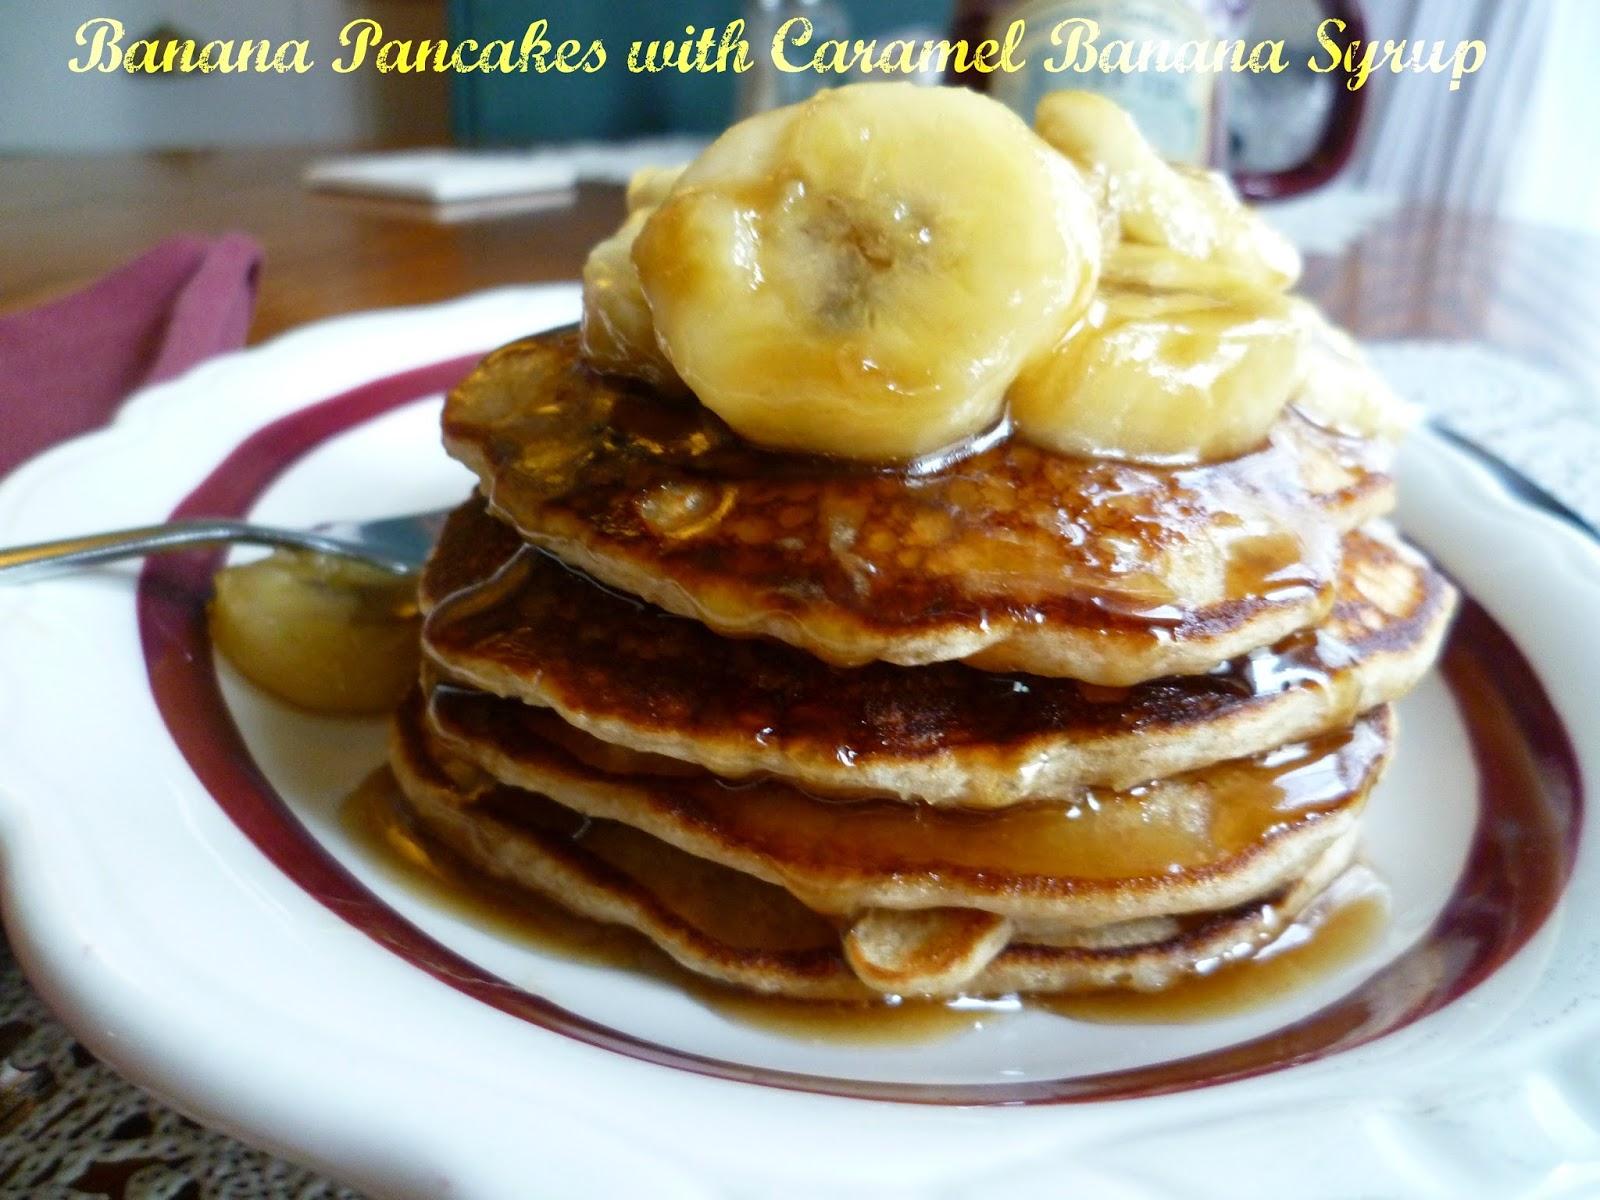 ... Inn Bed and Breakfast: Banana Pancakes with Caramel Banana Syrup